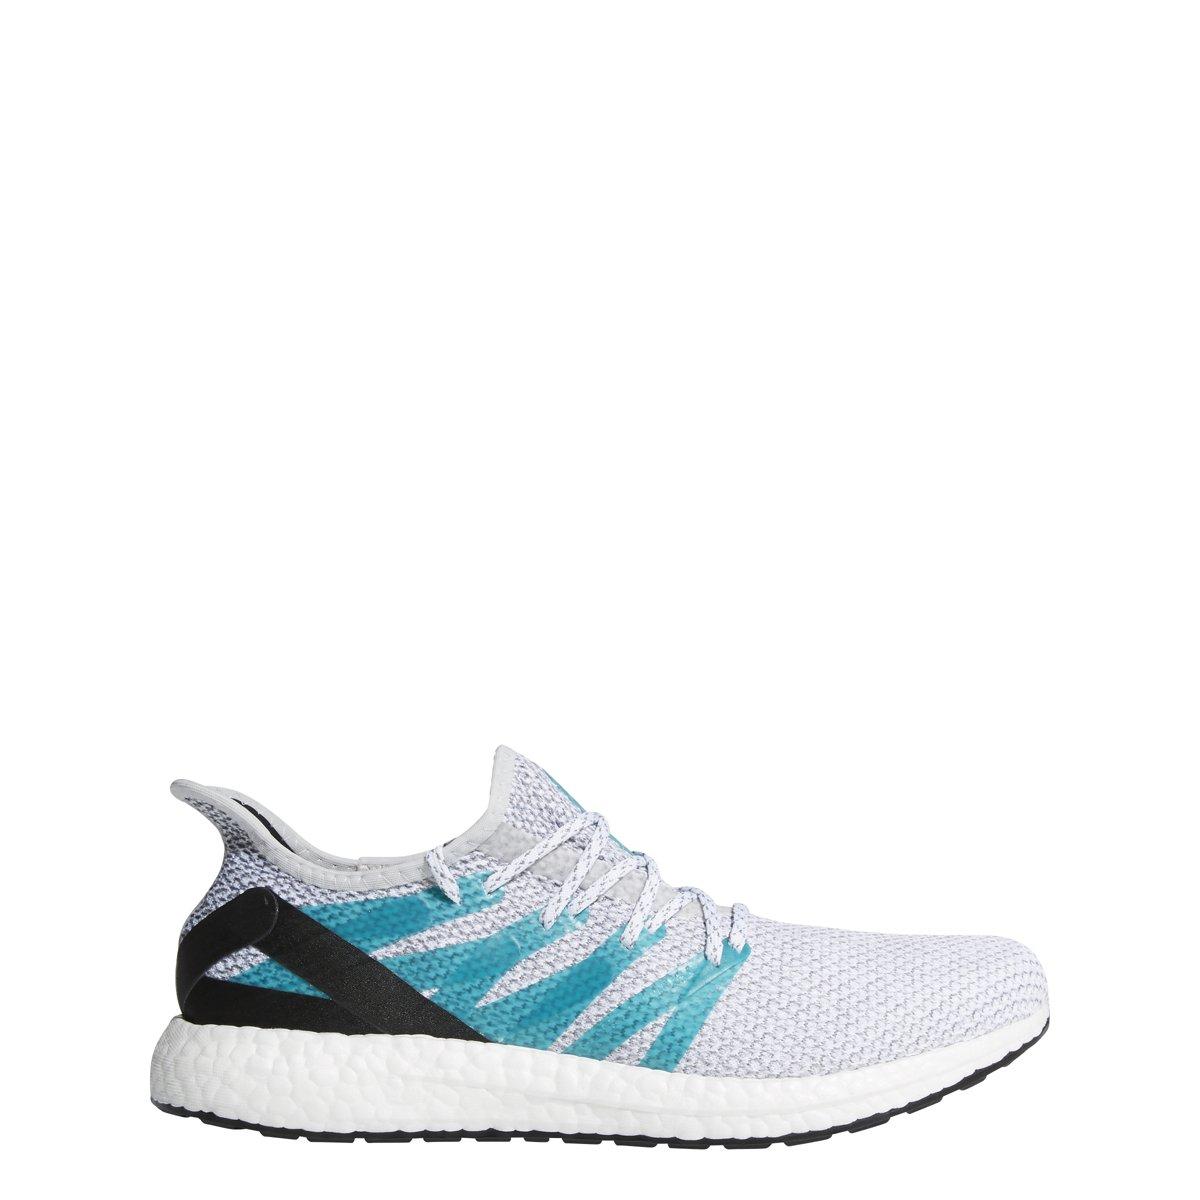 speedfactory hommes / femmes hommes am4ldn chaussure de adidas style de chaussure vie facile et amusant running supérieur d00360